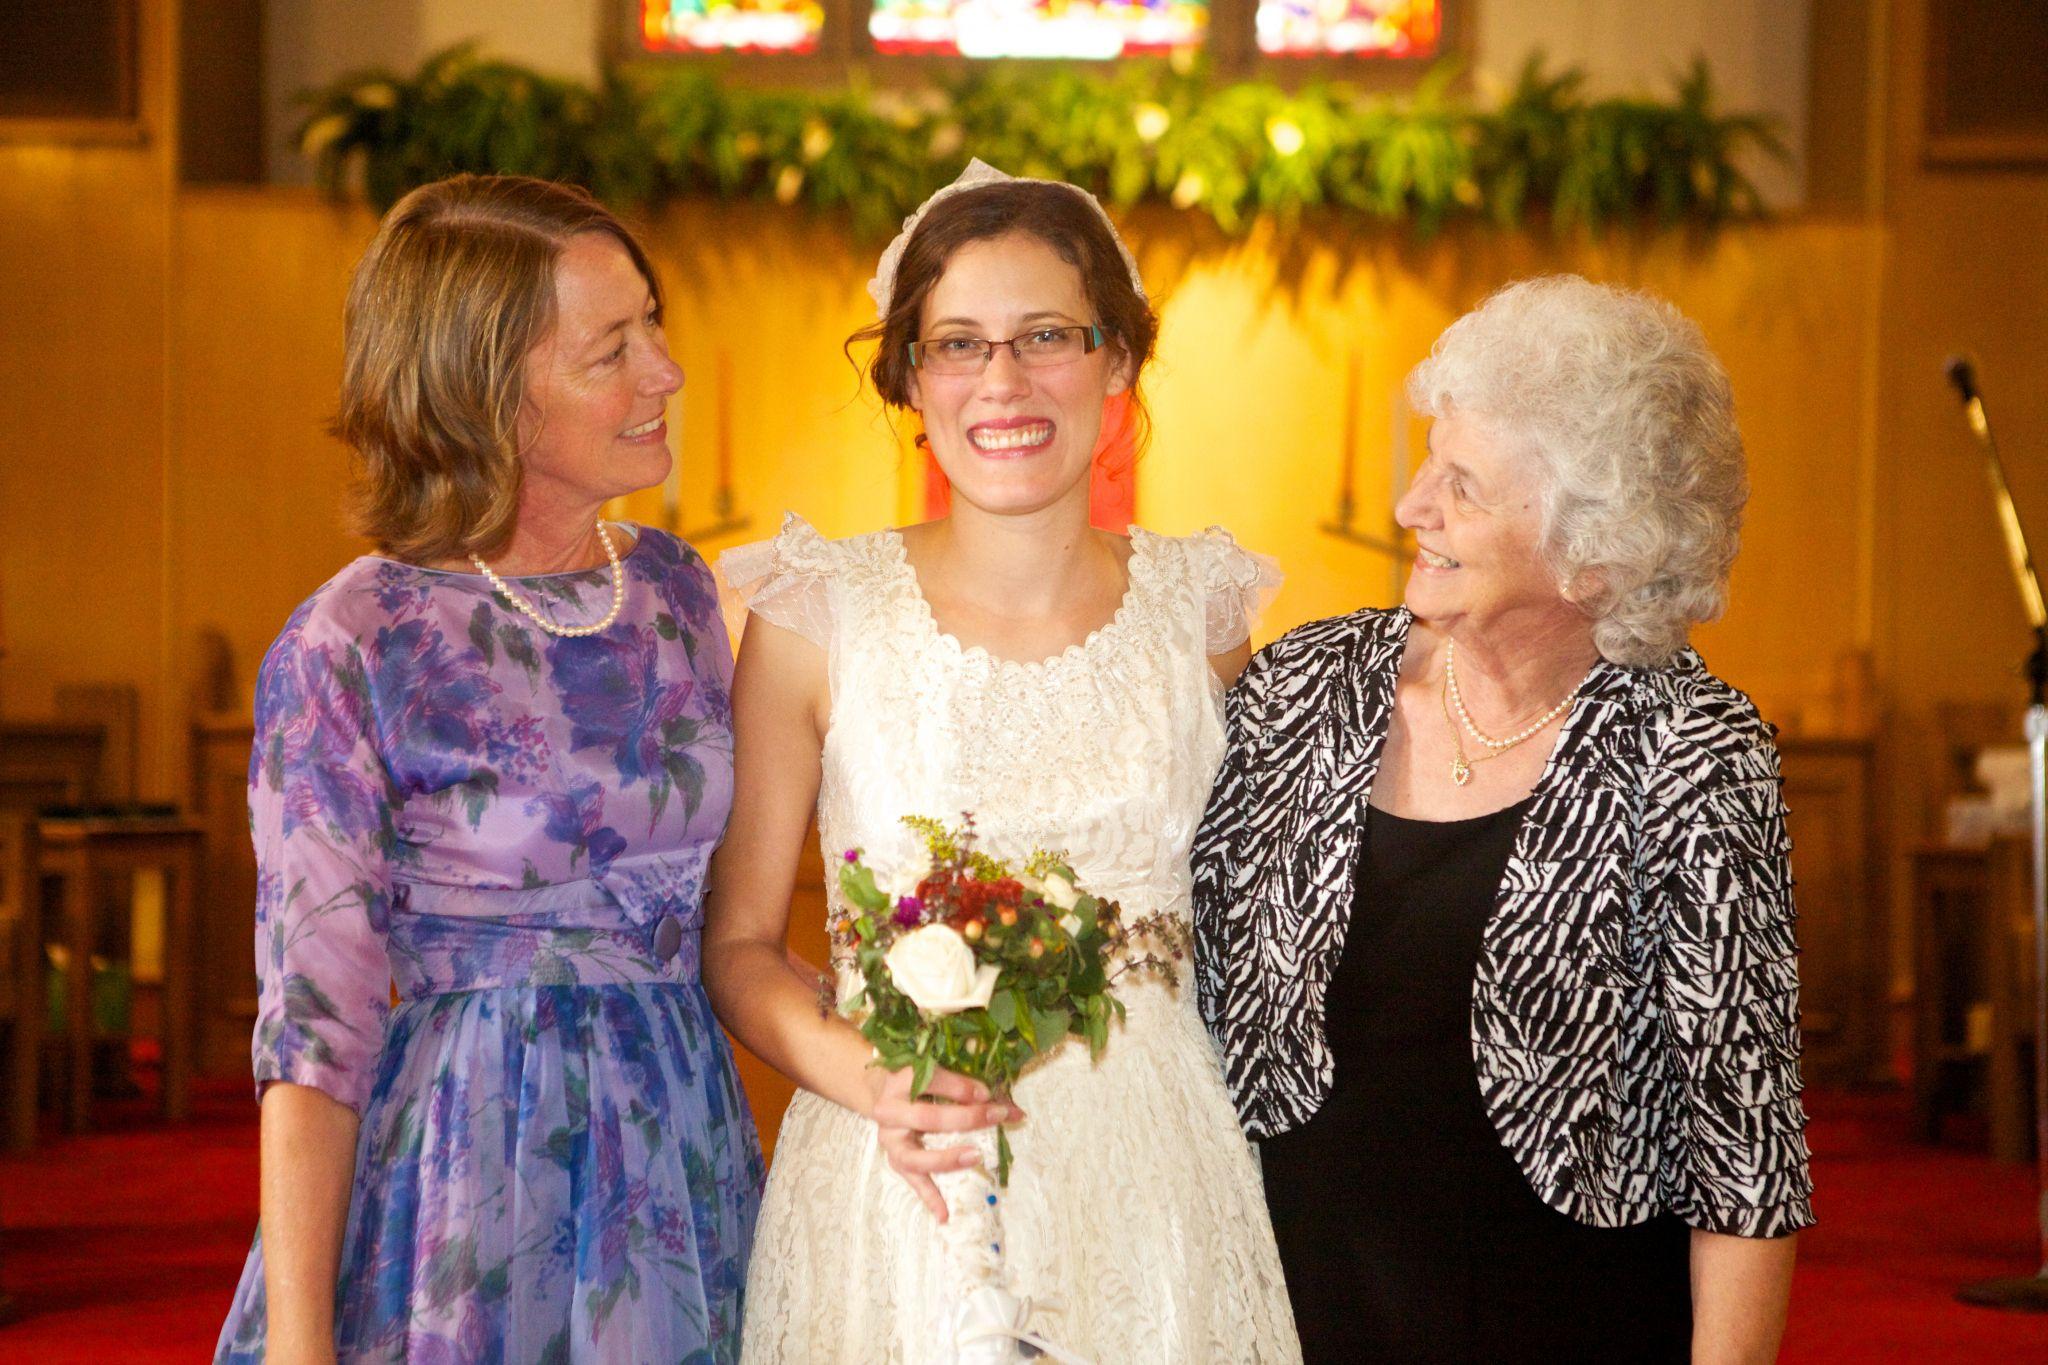 Luxury Grandma Dresses For Weddings Check More At Http Svesty Com Grandma Dresses For Weddings Wedding Dresses Grandma Dress Popular Wedding Dresses [ 1365 x 2048 Pixel ]